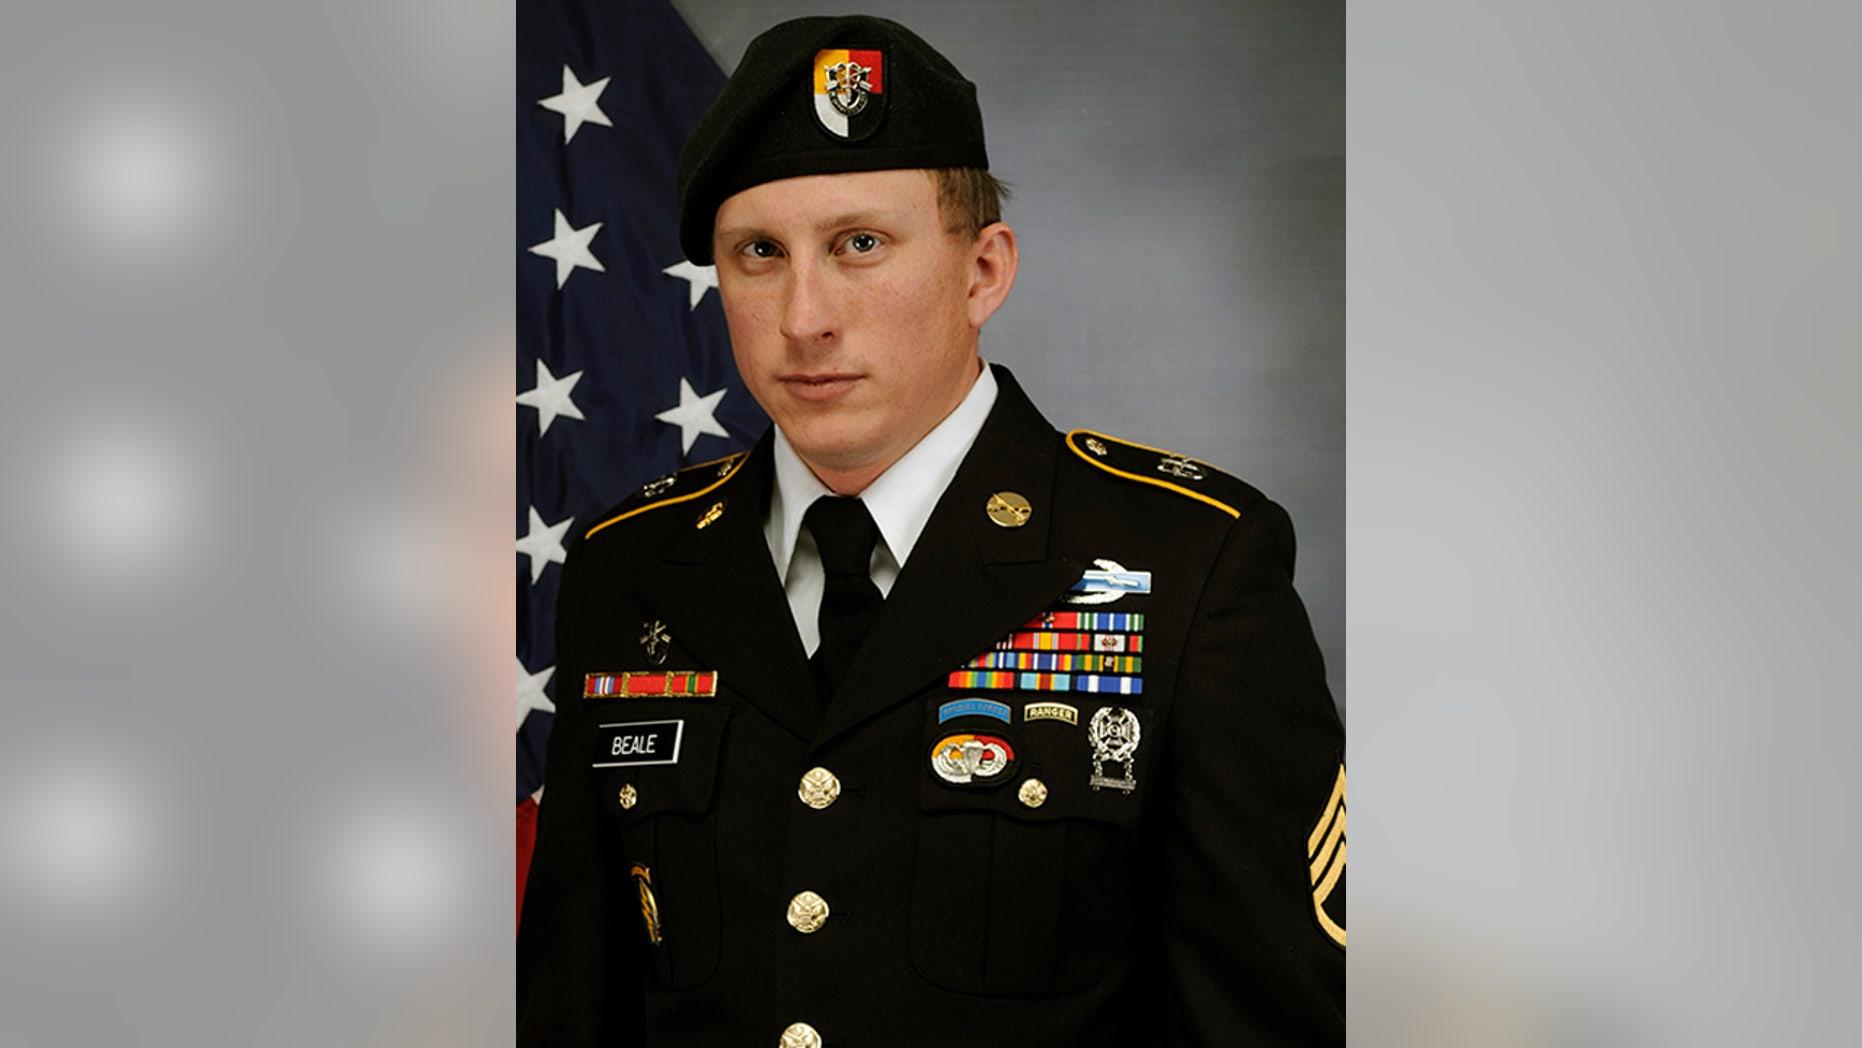 U.S. Army Special Forces Sgt. 1st Class Joshua Beale. (Fort Bragg Public Affairs via AP)